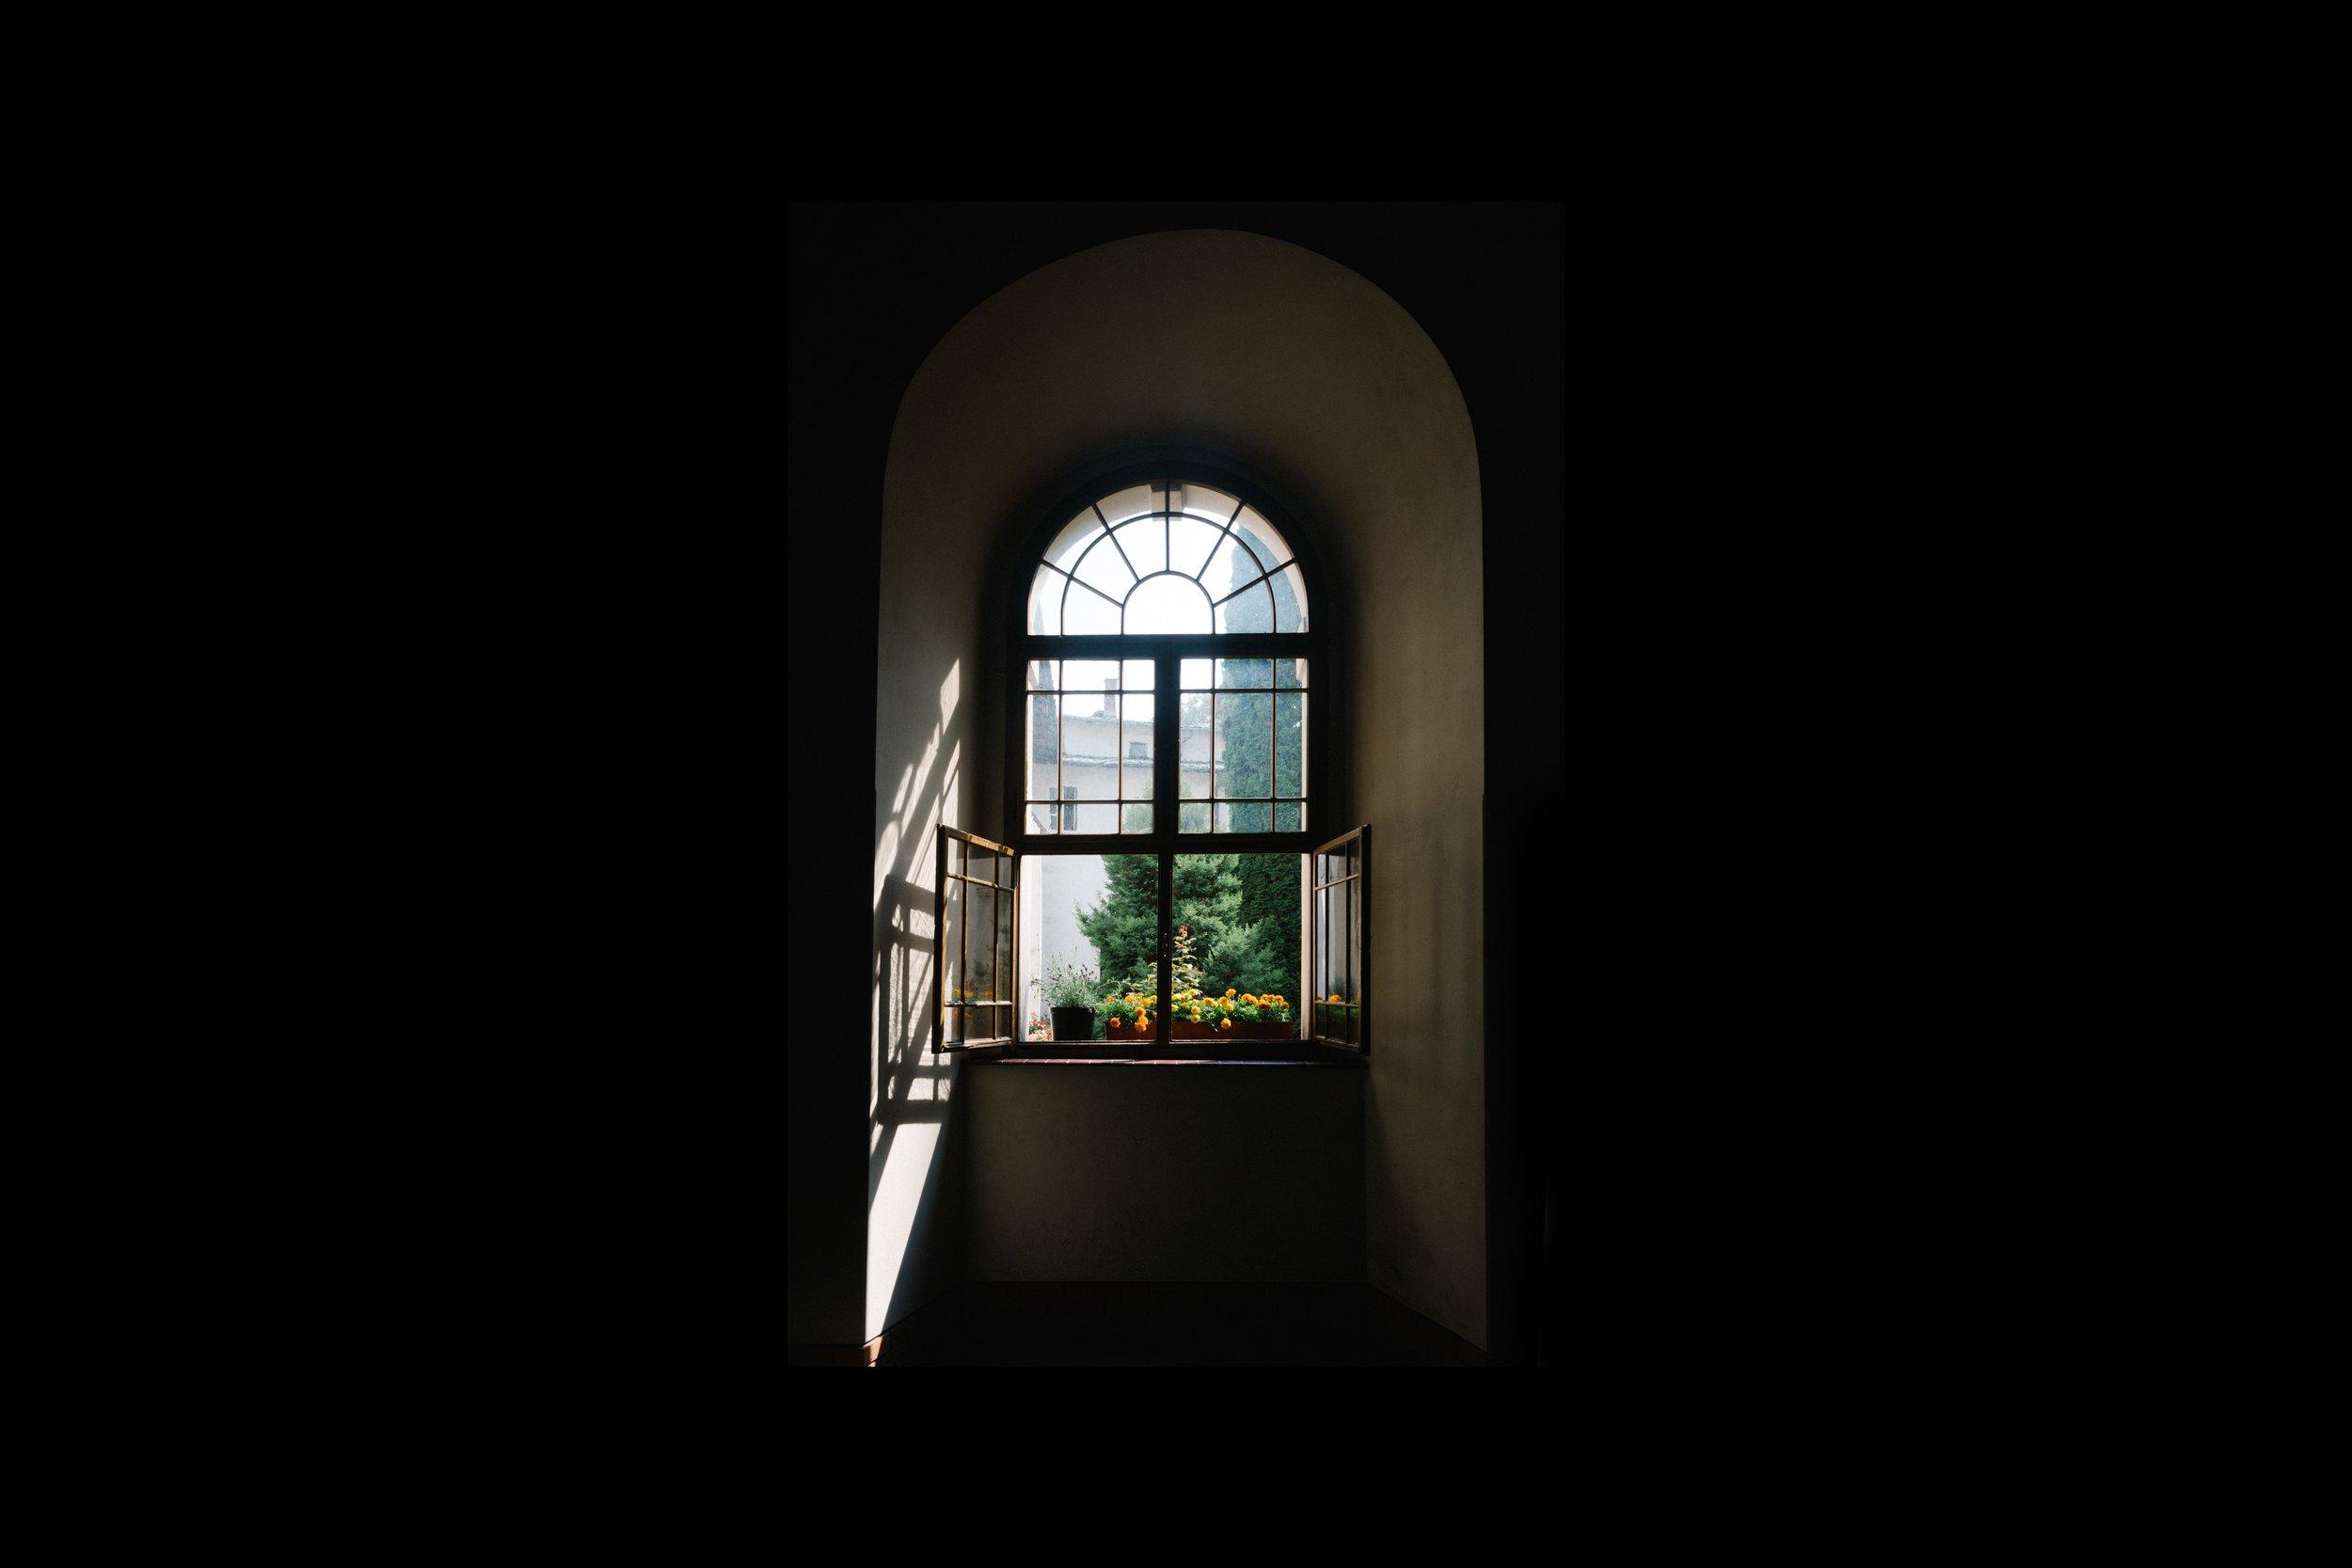 windows, ceiling, floor